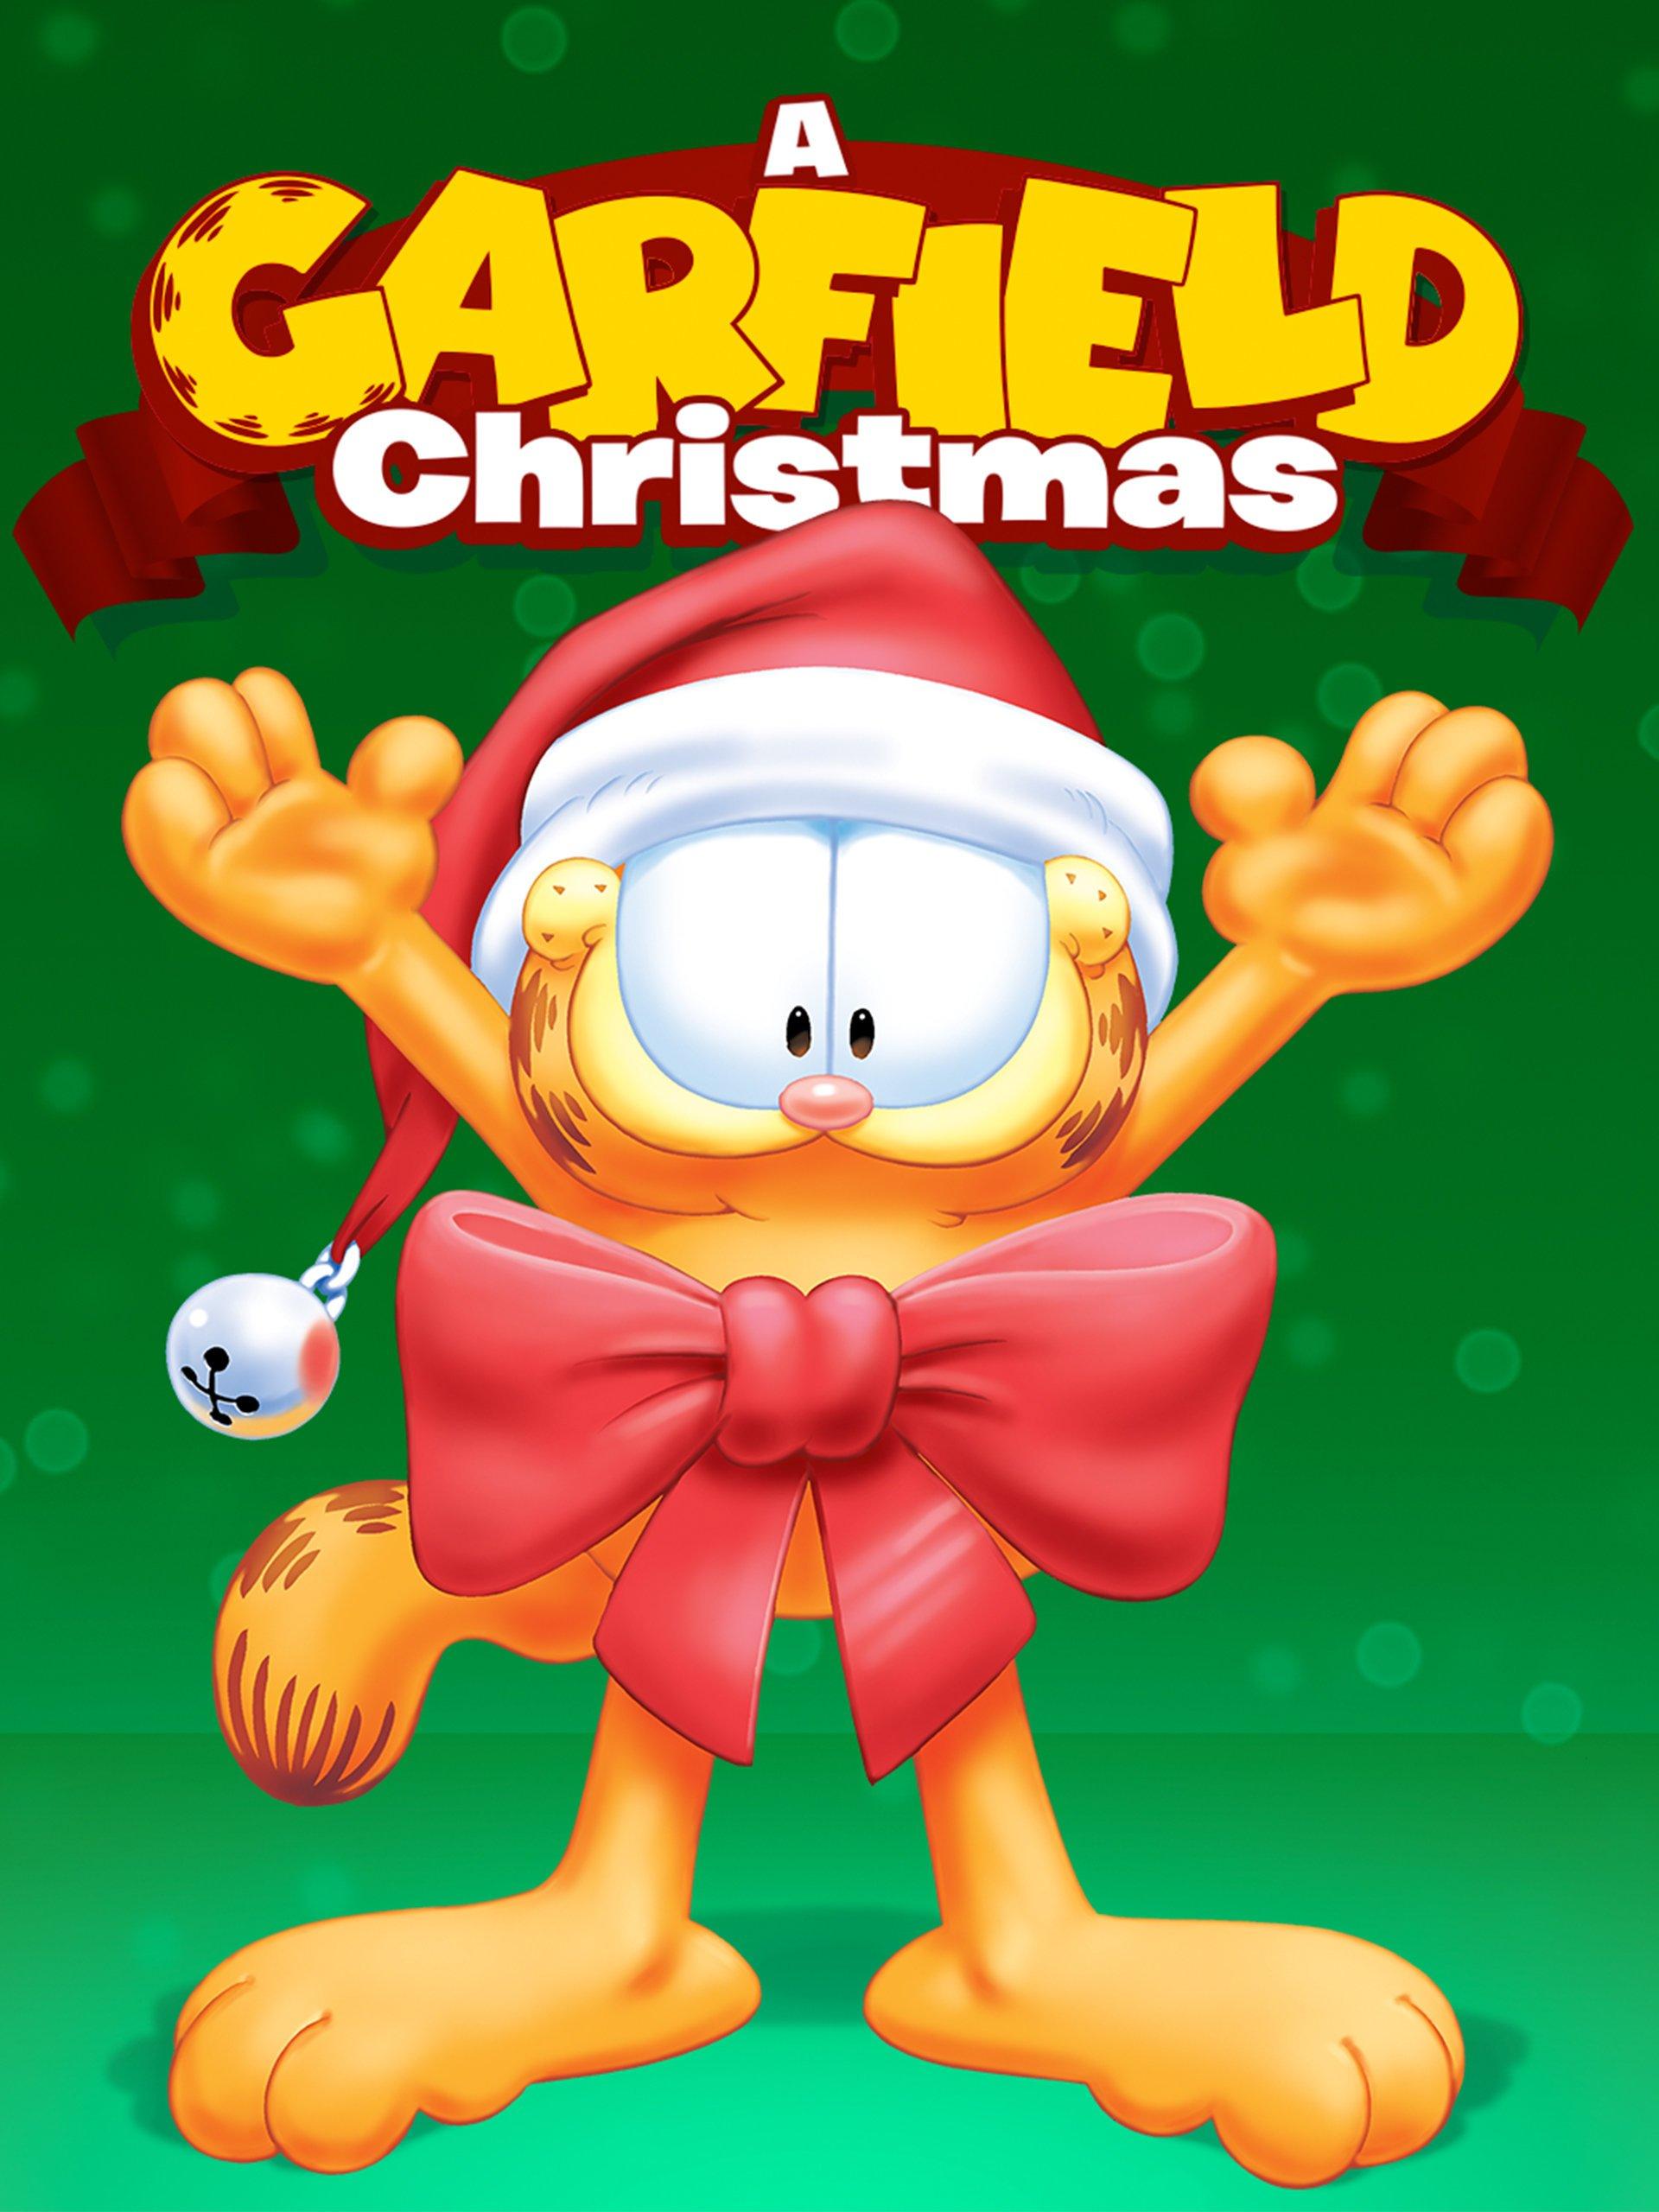 Garfield Christmas.Amazon Com A Garfield Christmas Phil Roman Jim Davis